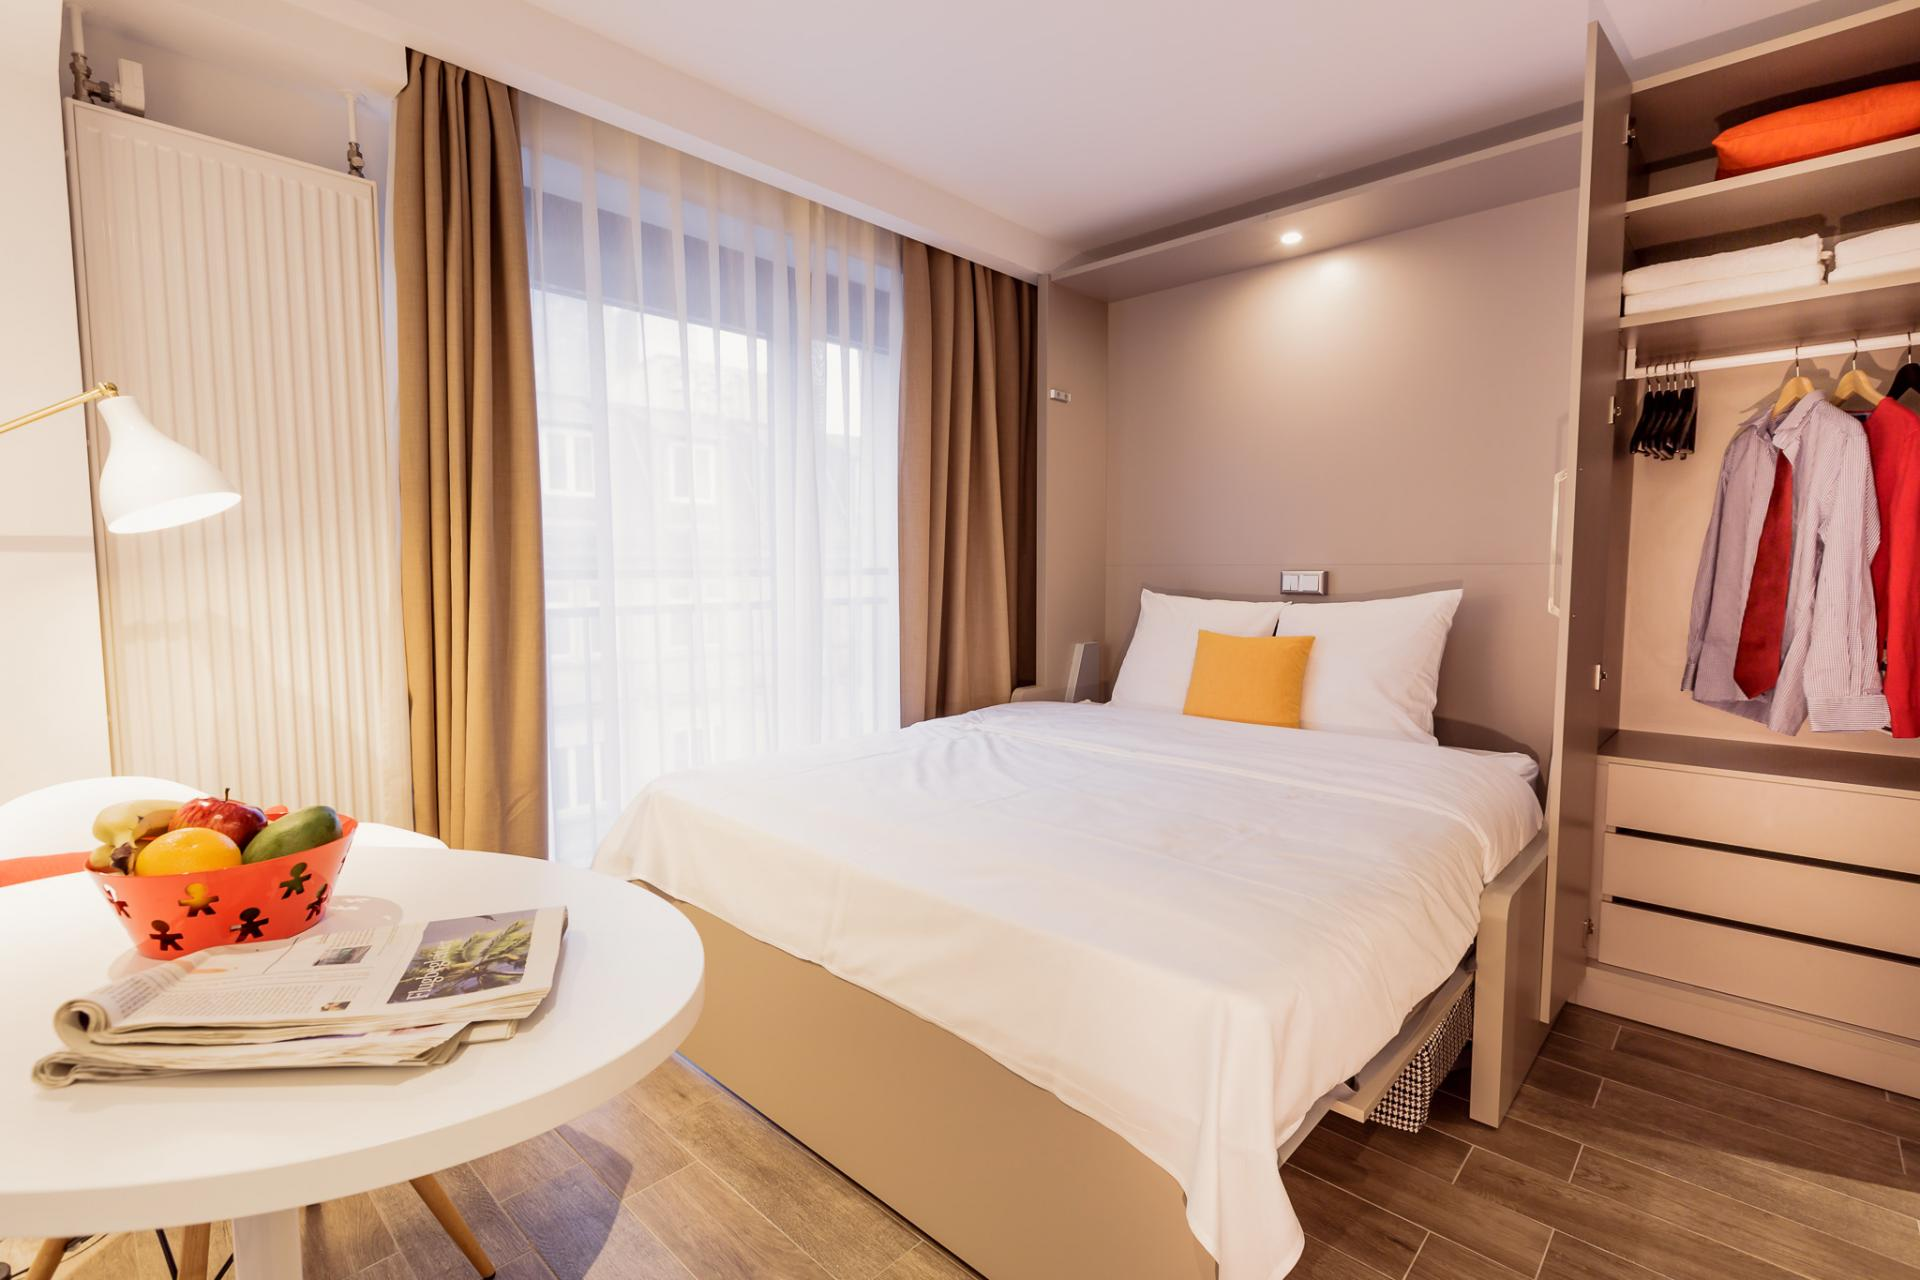 Bedroom at Brera Elbestrasse 29 - Citybase Apartments